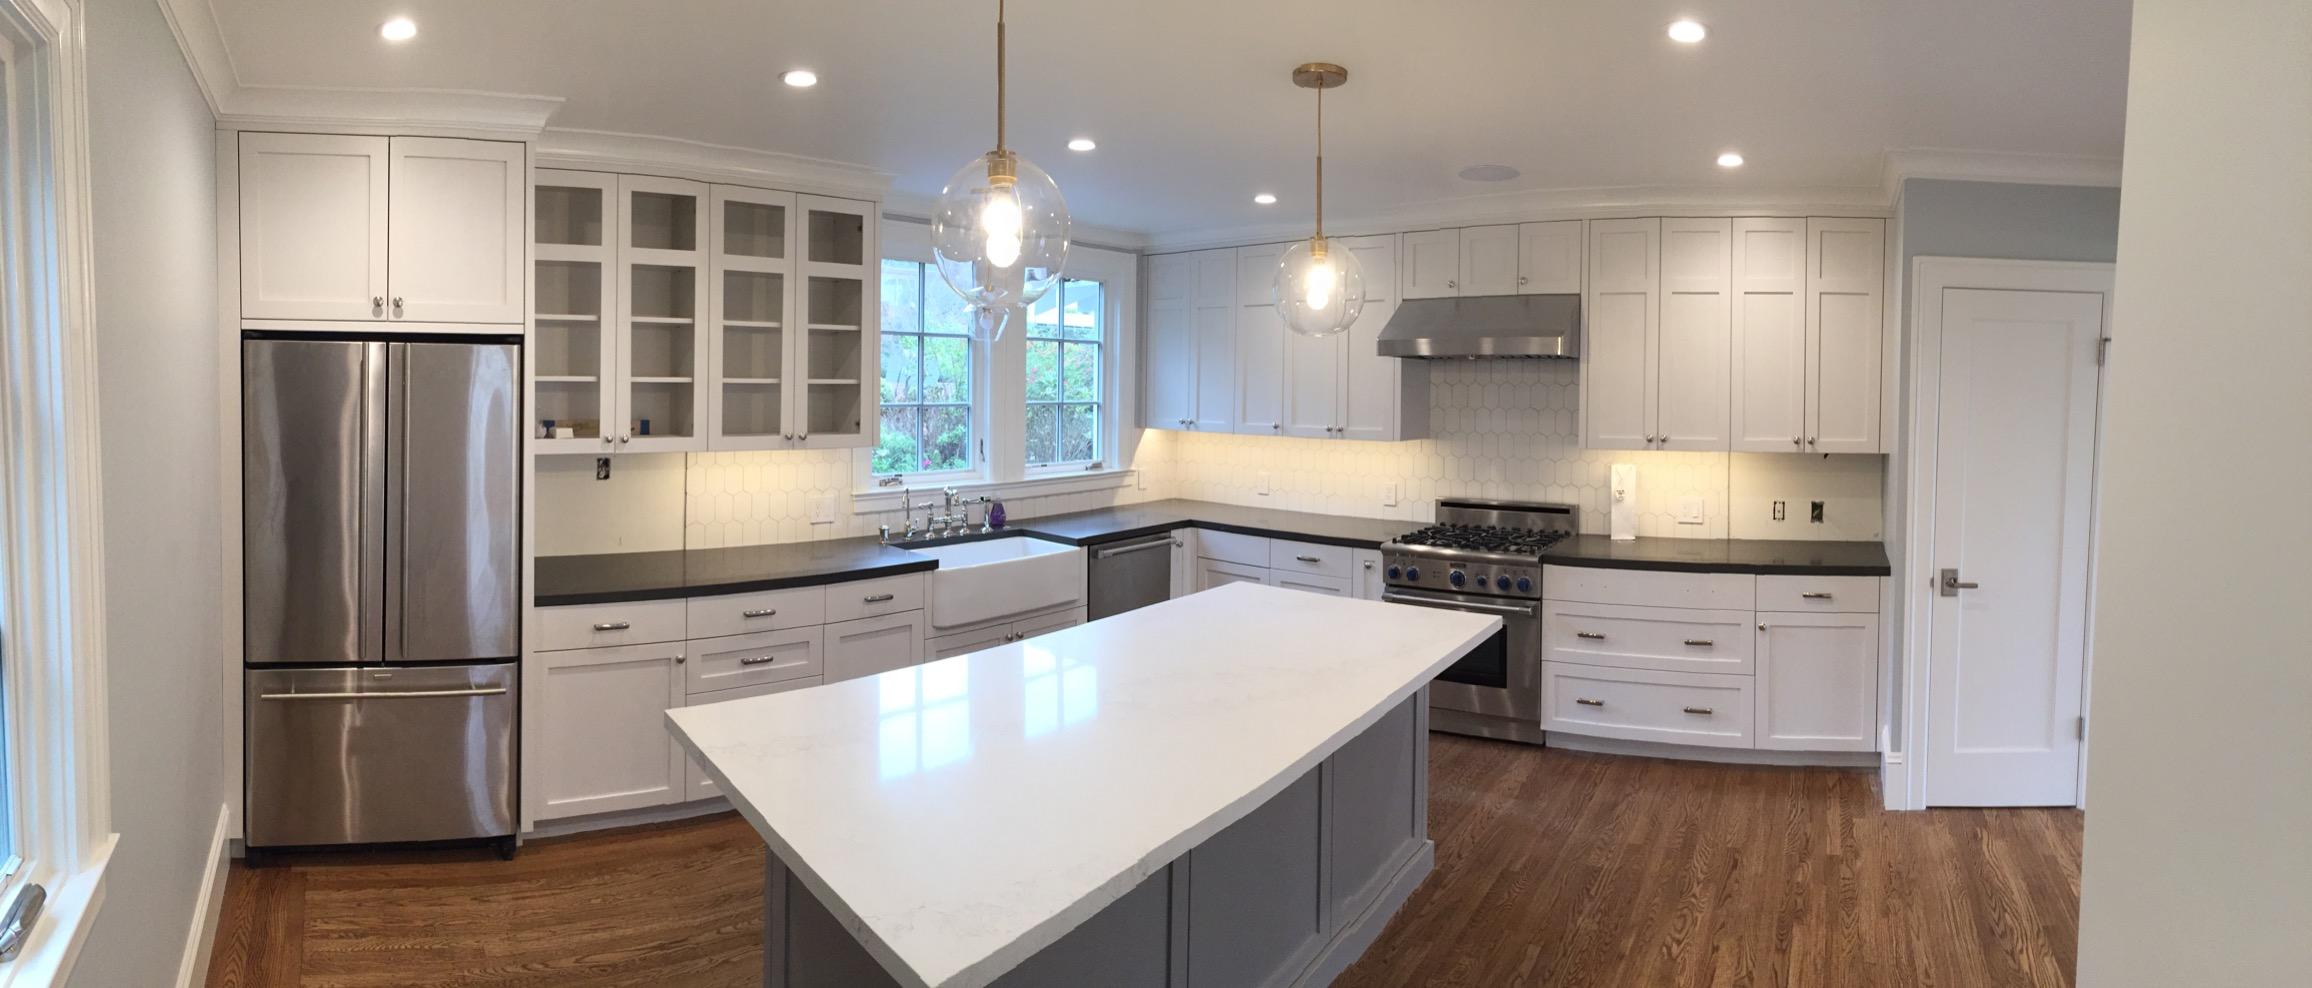 455-mountain-ave-piedmont-ca-kitchen-optim.jpg